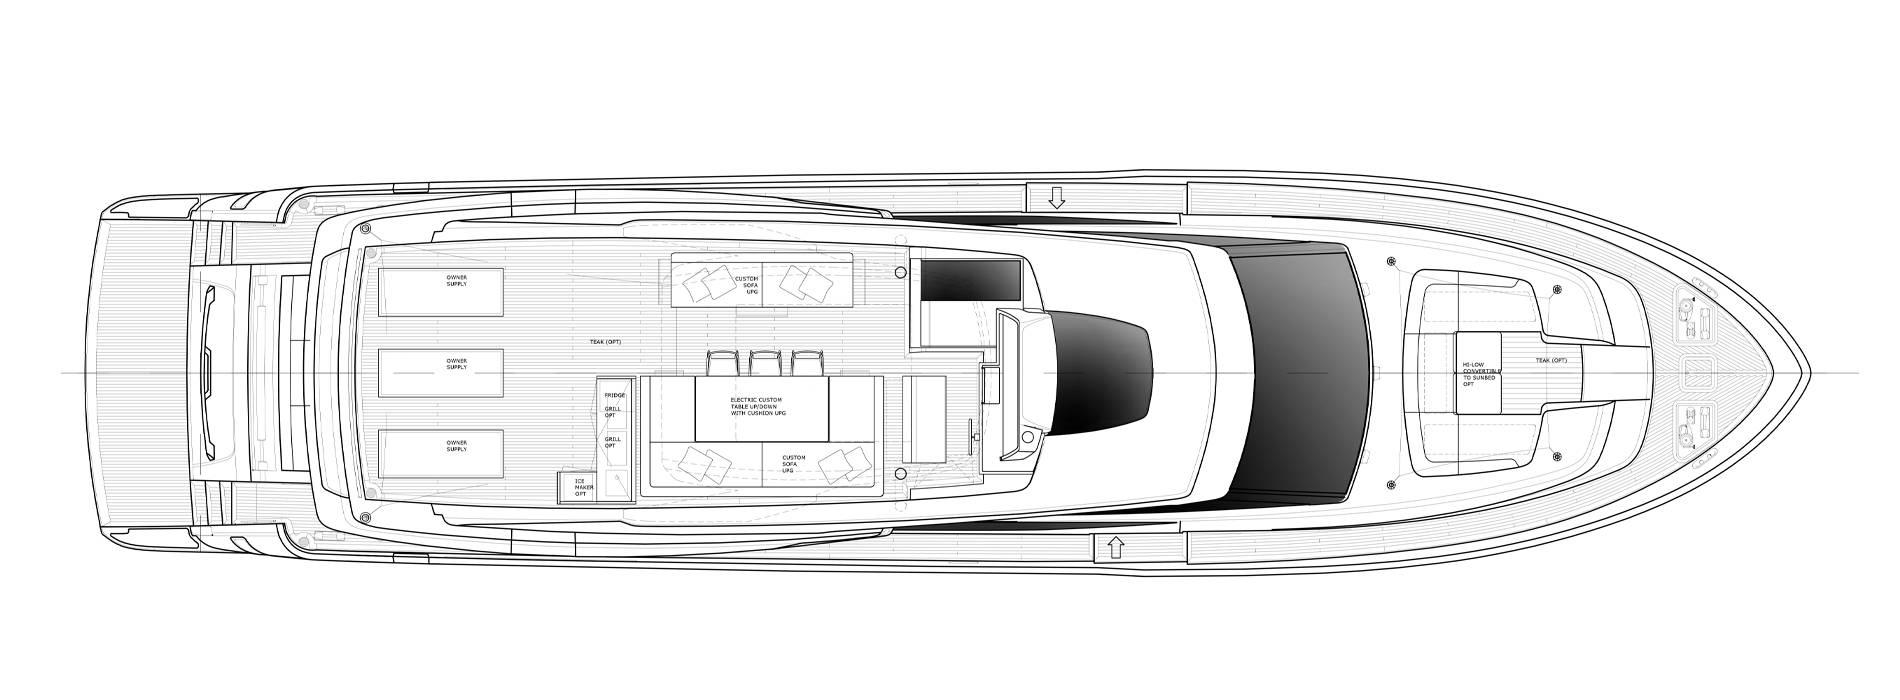 Sanlorenzo Yachts SL86-727 Флайбридж